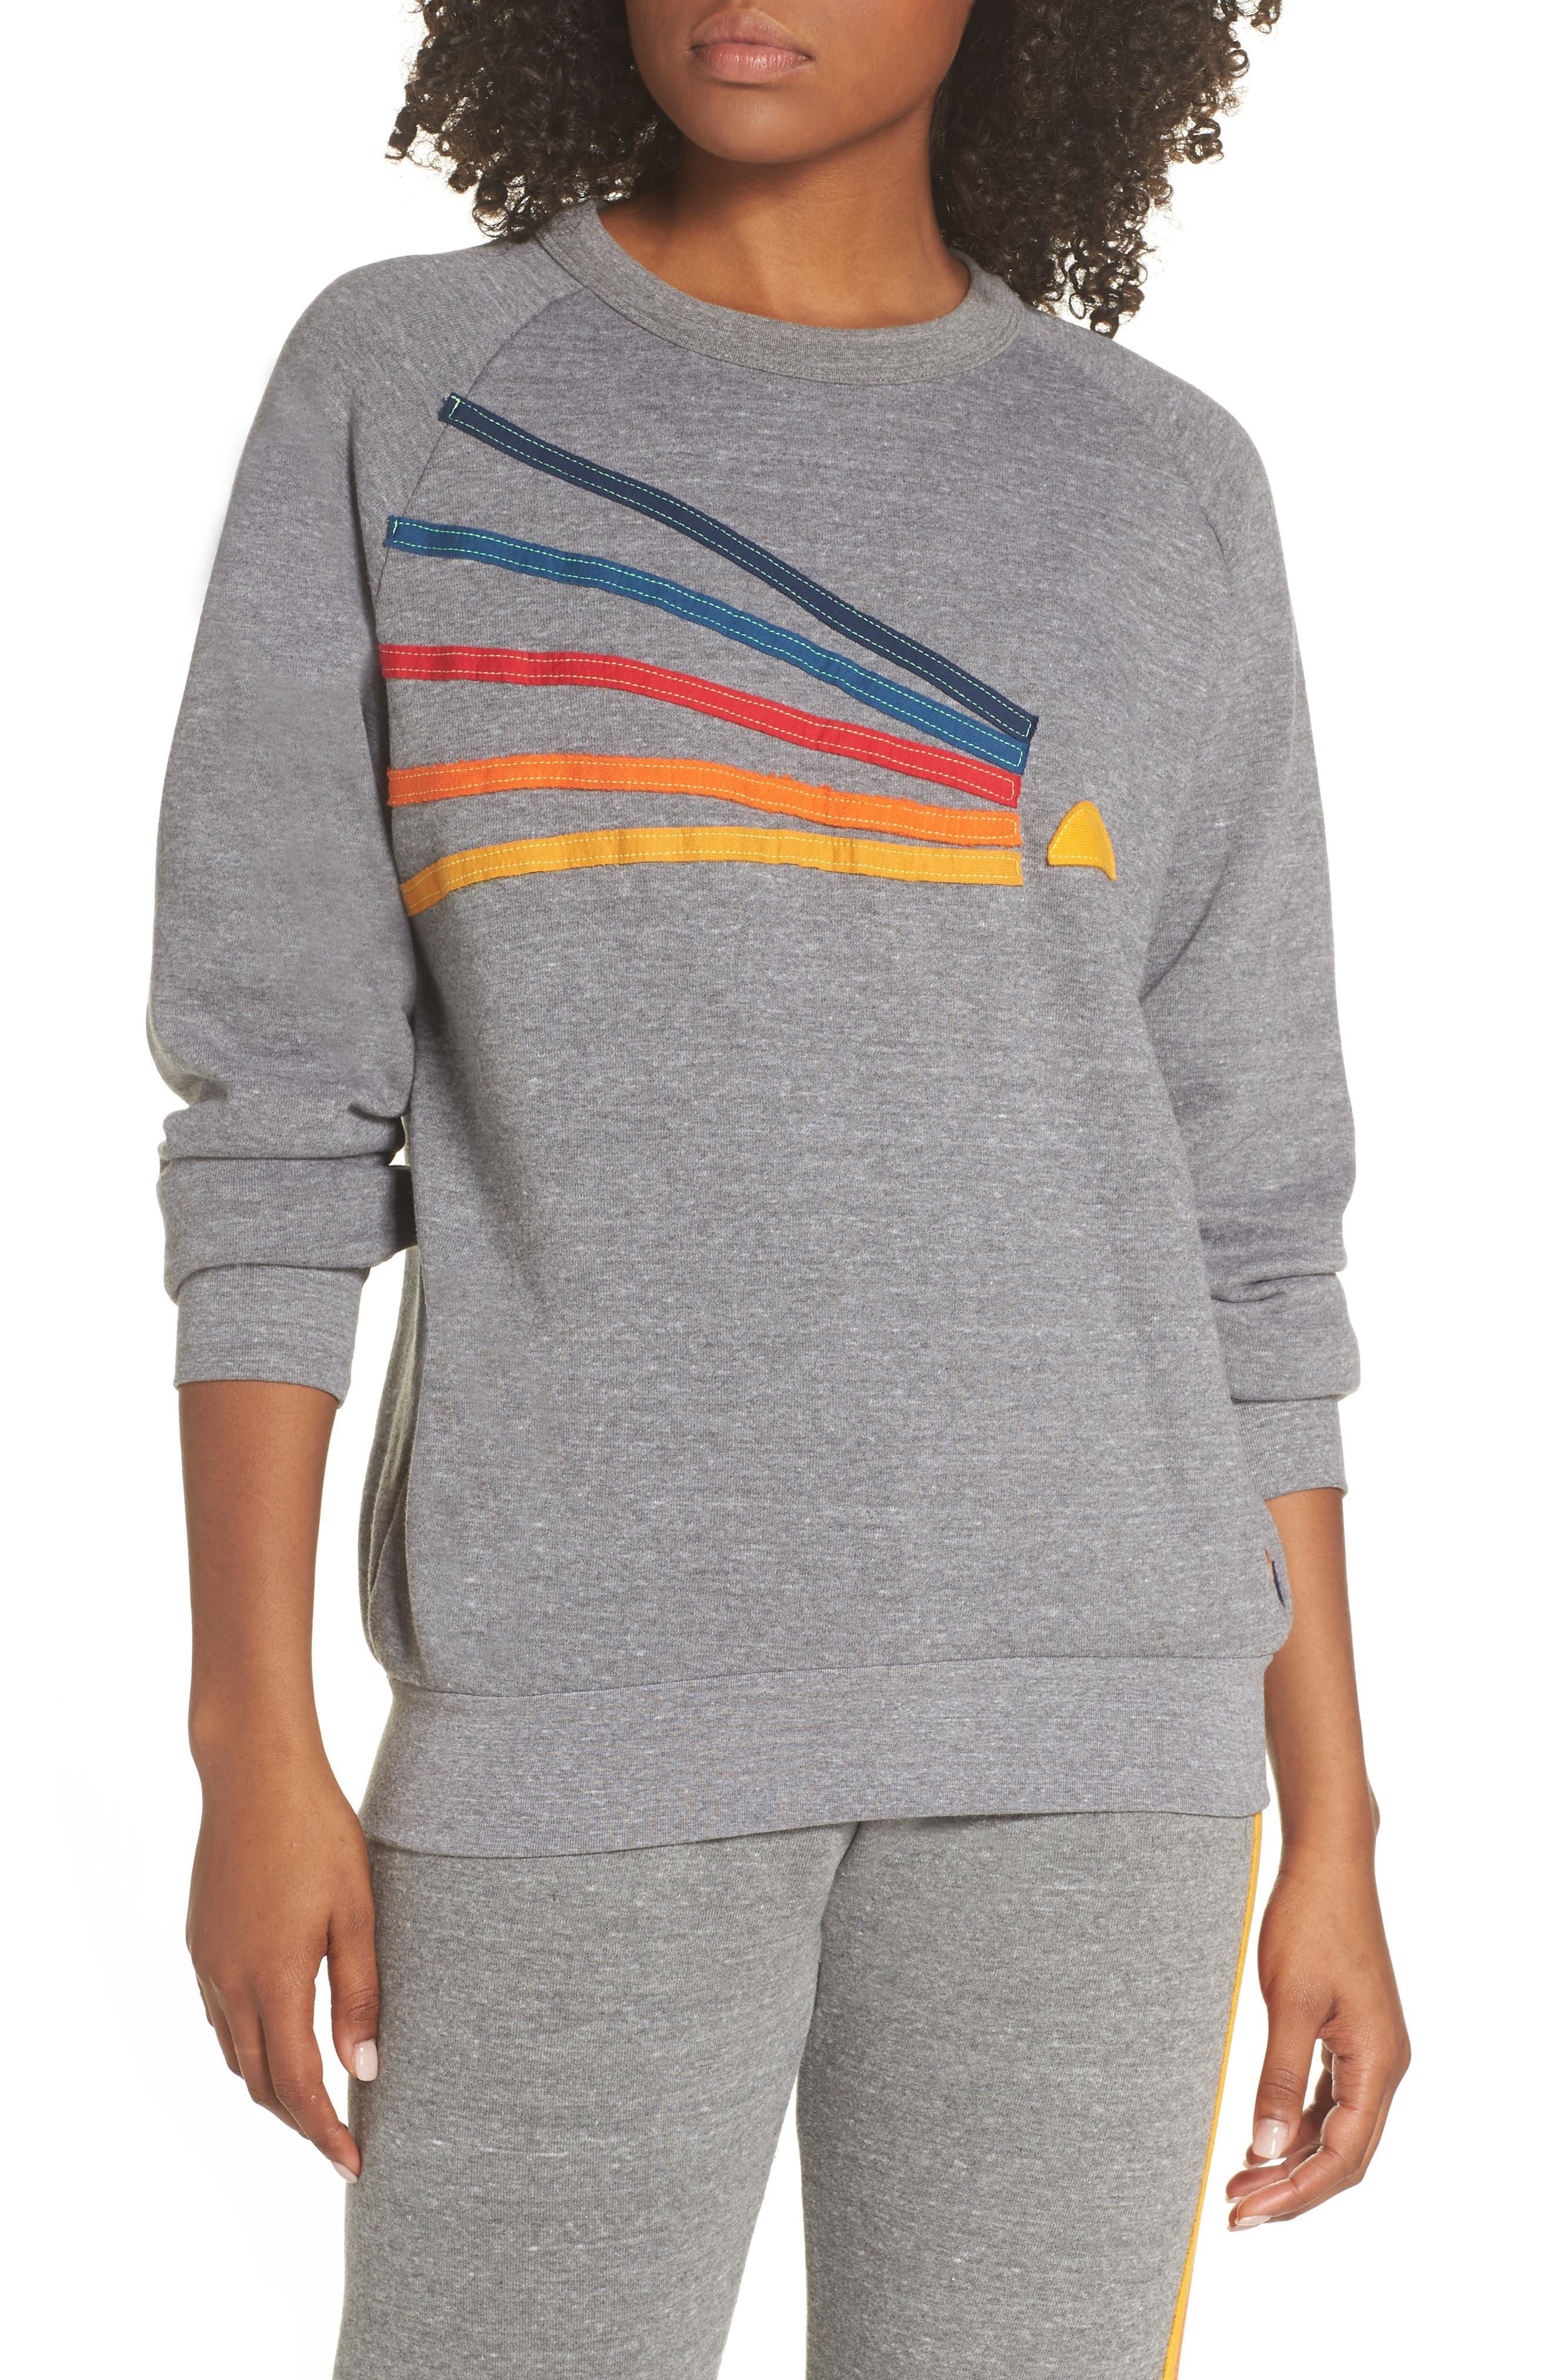 Daydream Sweatshirt,                             Main thumbnail 1, color,                             HEATHER GREY